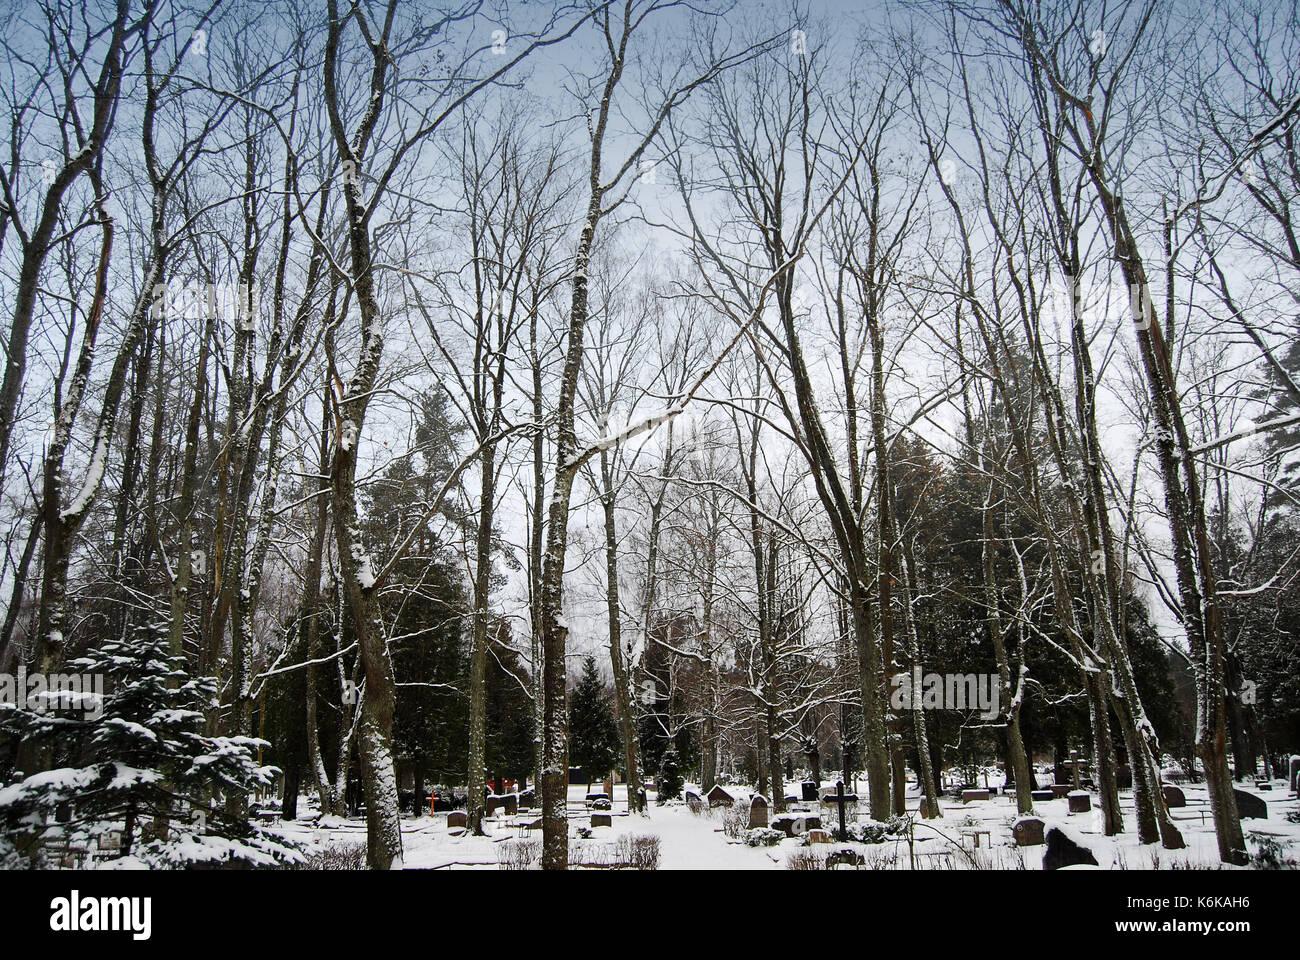 Cemetery in winter - Stock Image